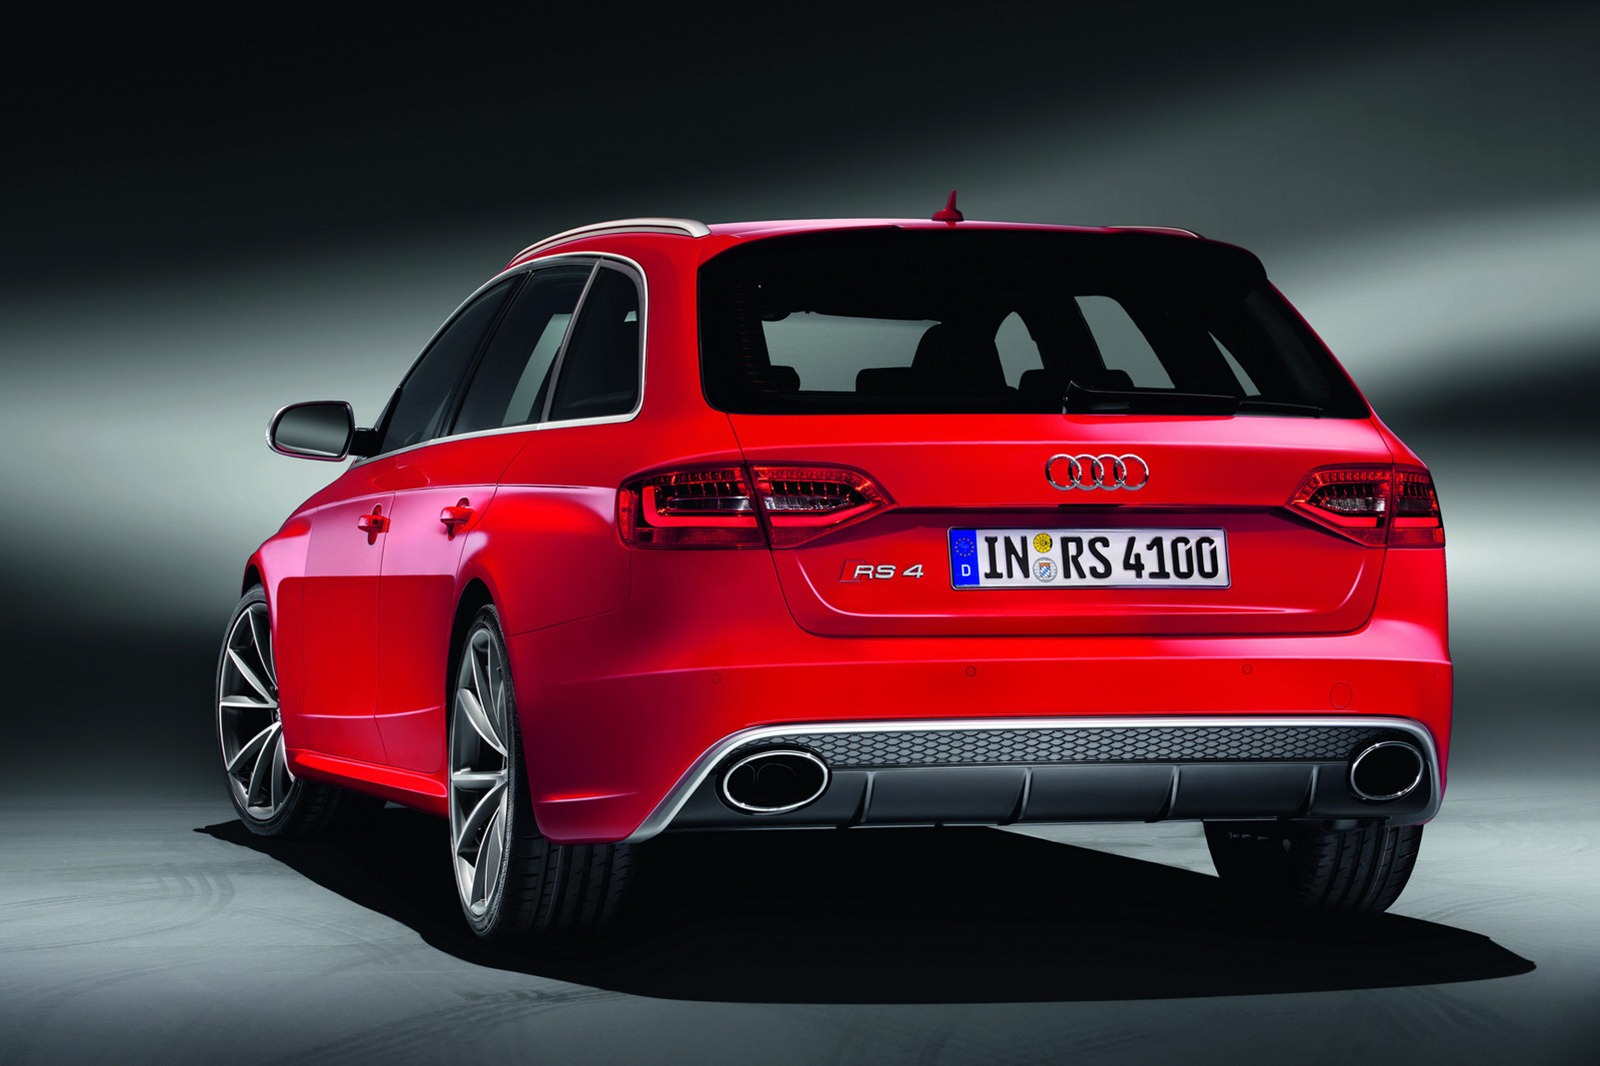 2012 Audi RS4 Avant Specs and Photos - autoevolution